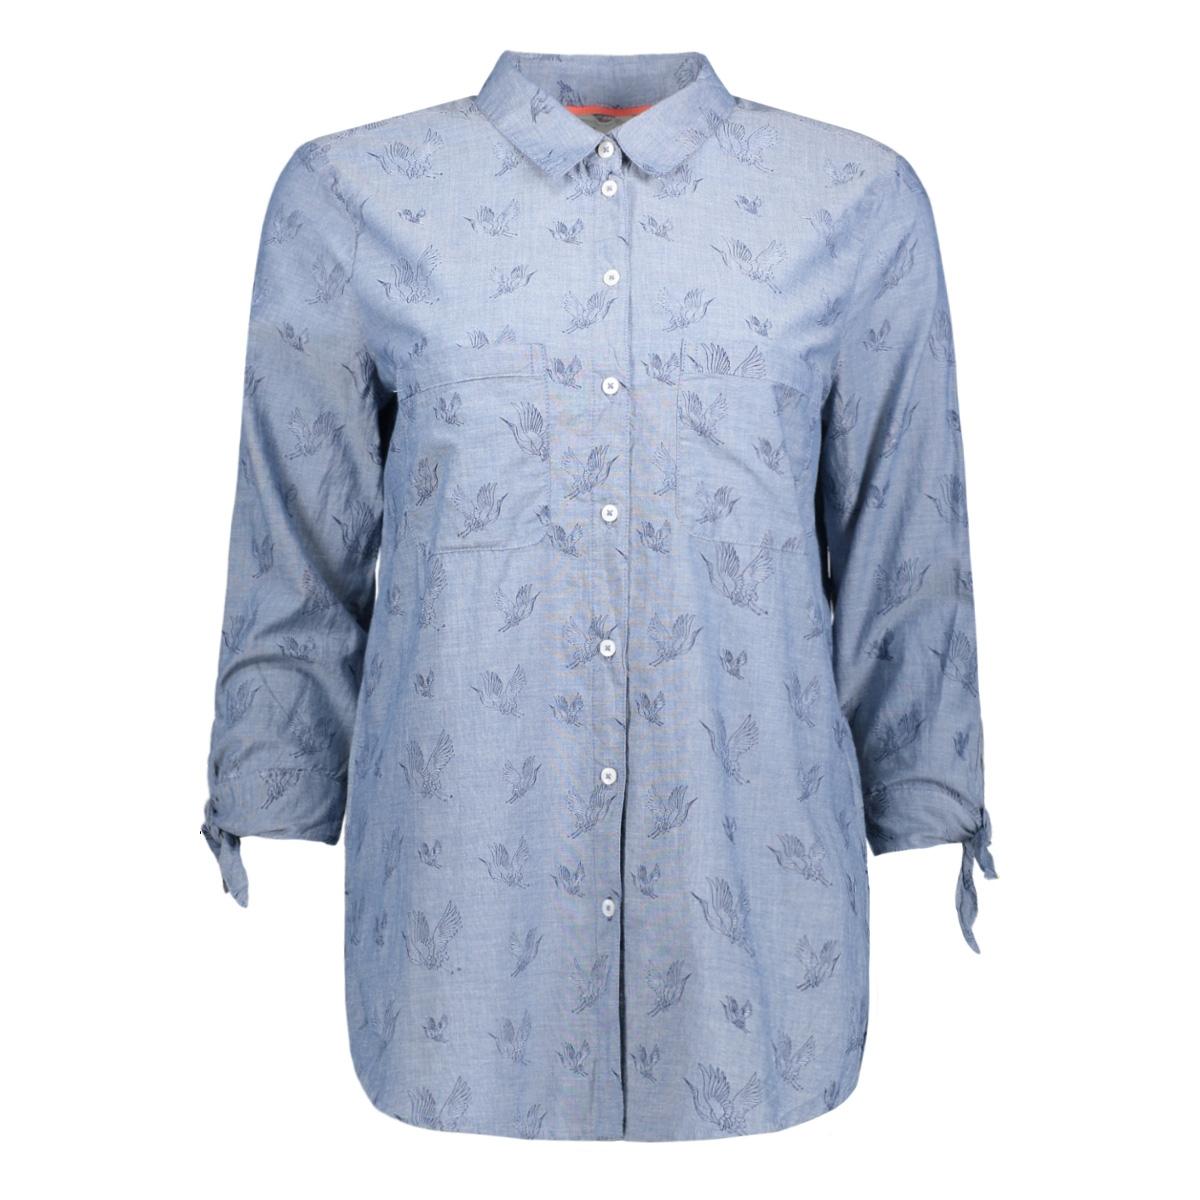 2055012.00.71 tom tailor blouse 1008